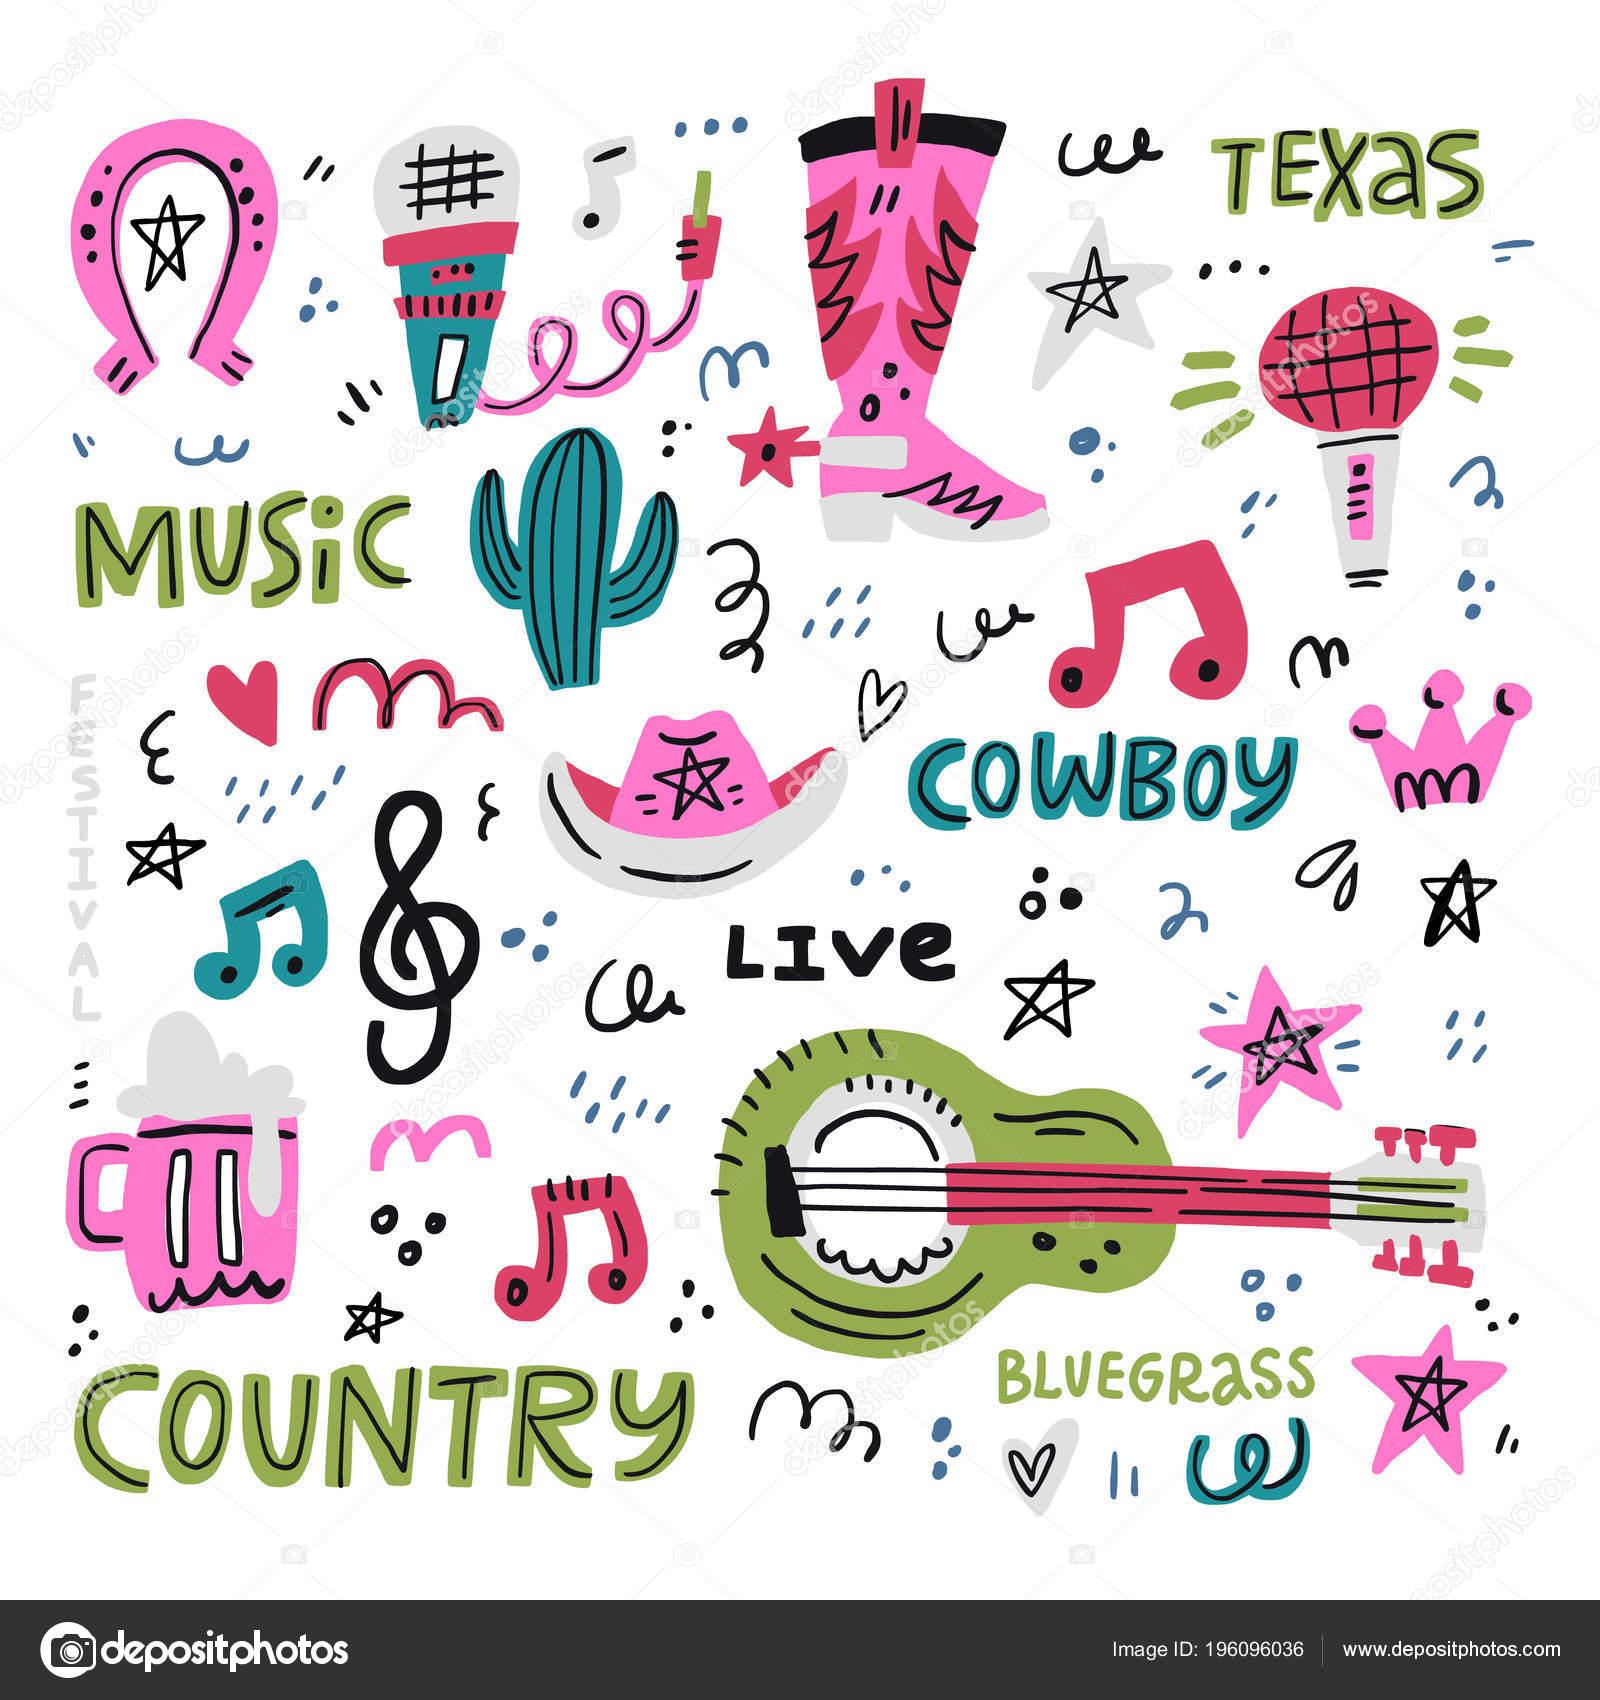 Country Music Illustration Stock Vector Favetelinguis199 196096036